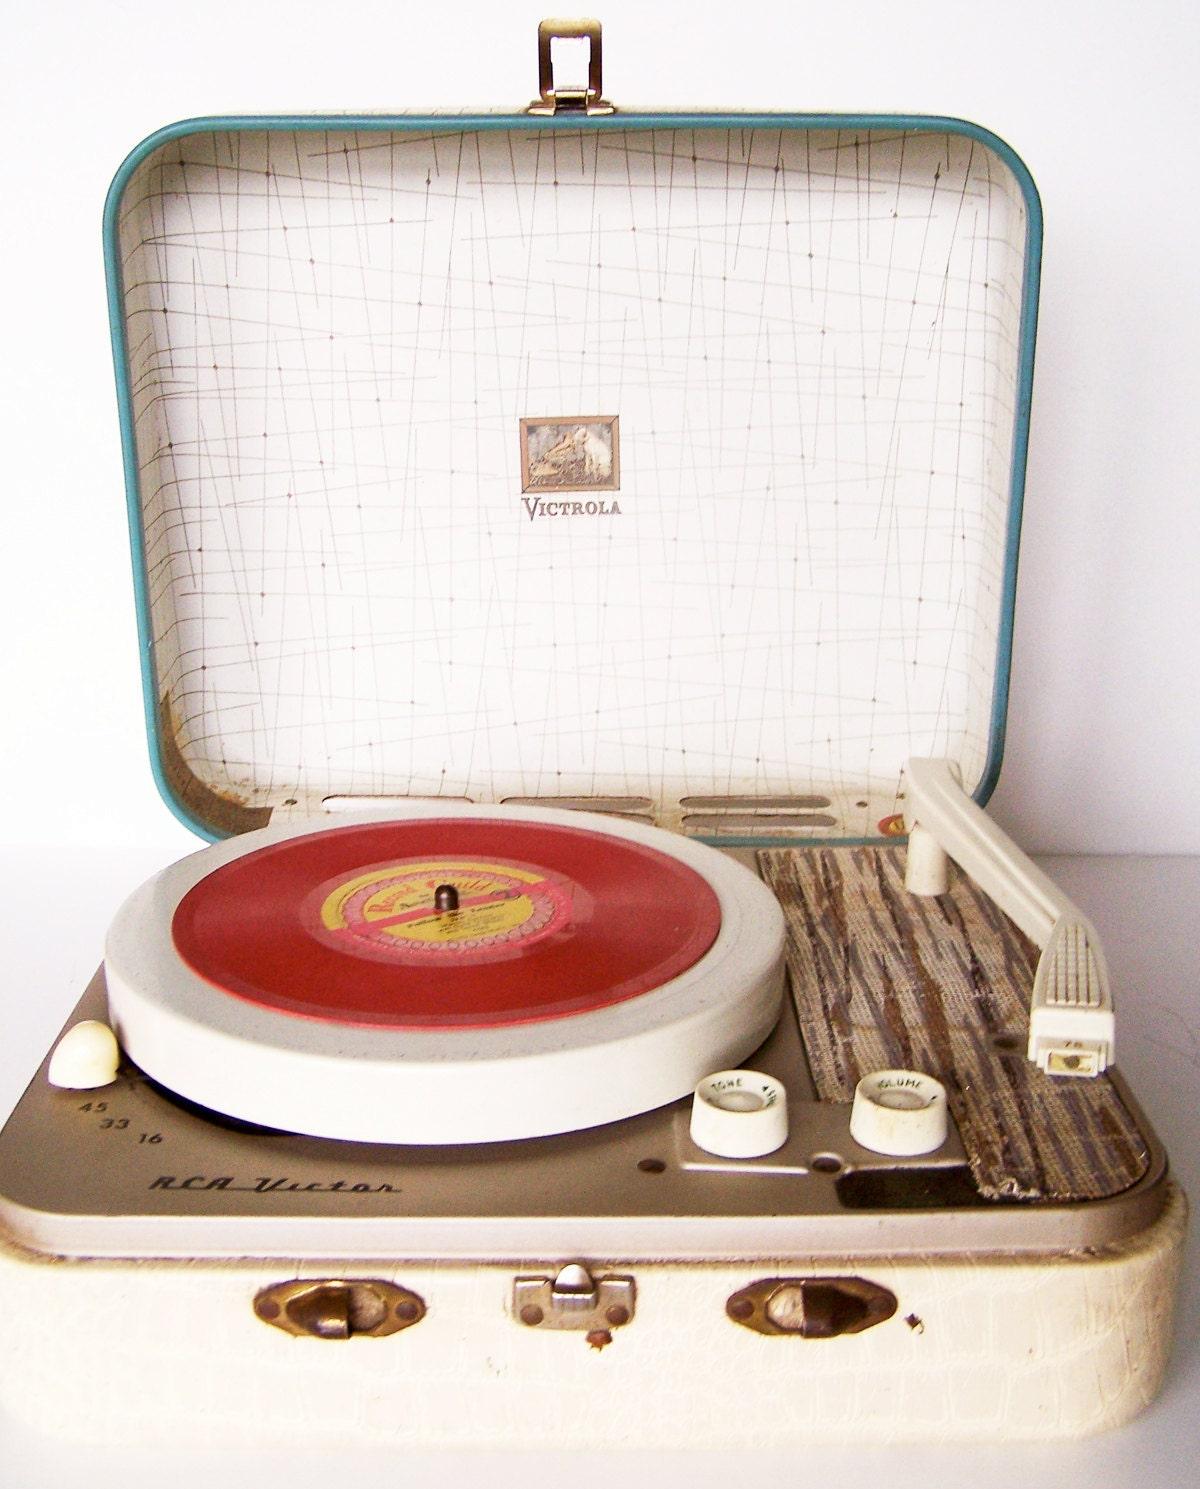 Vintage 1950s Rca Victrola Kid 39 S Portable Record Player